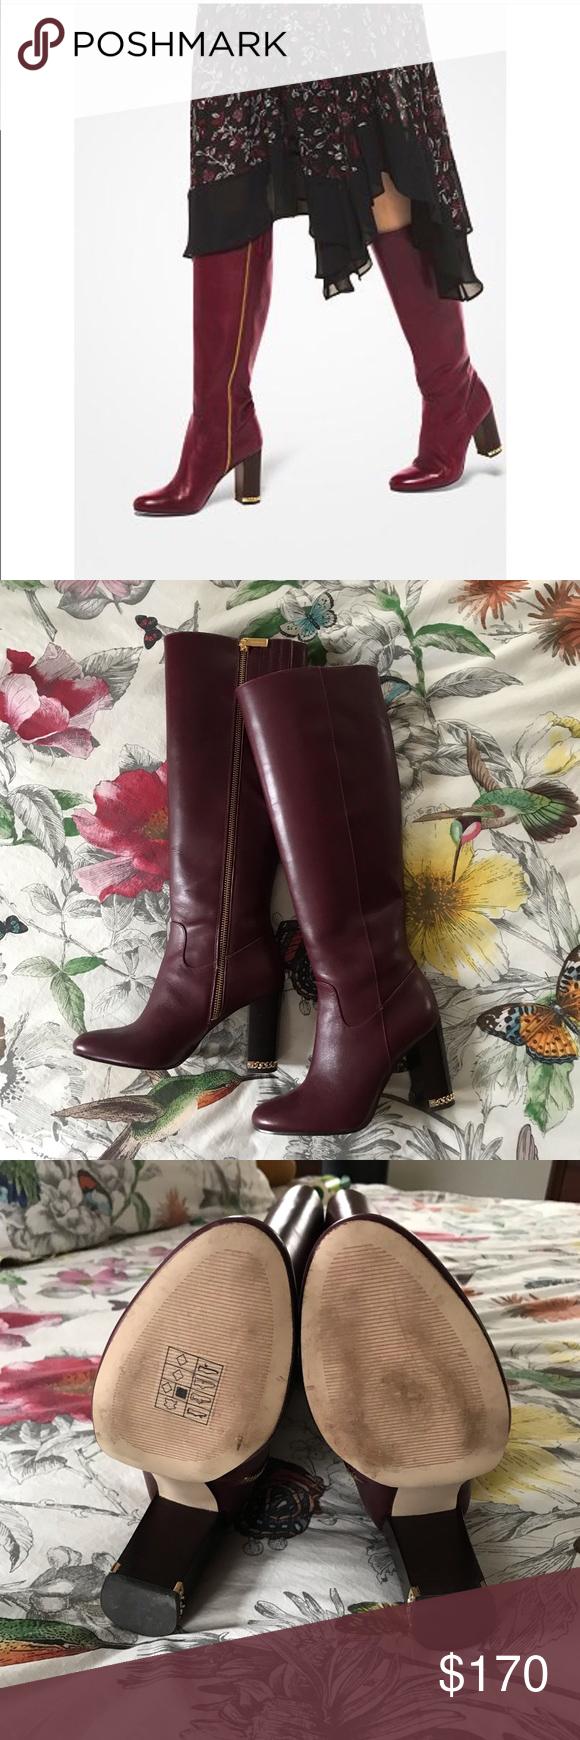 MICHAEL KORS Walker boots in Oxblood